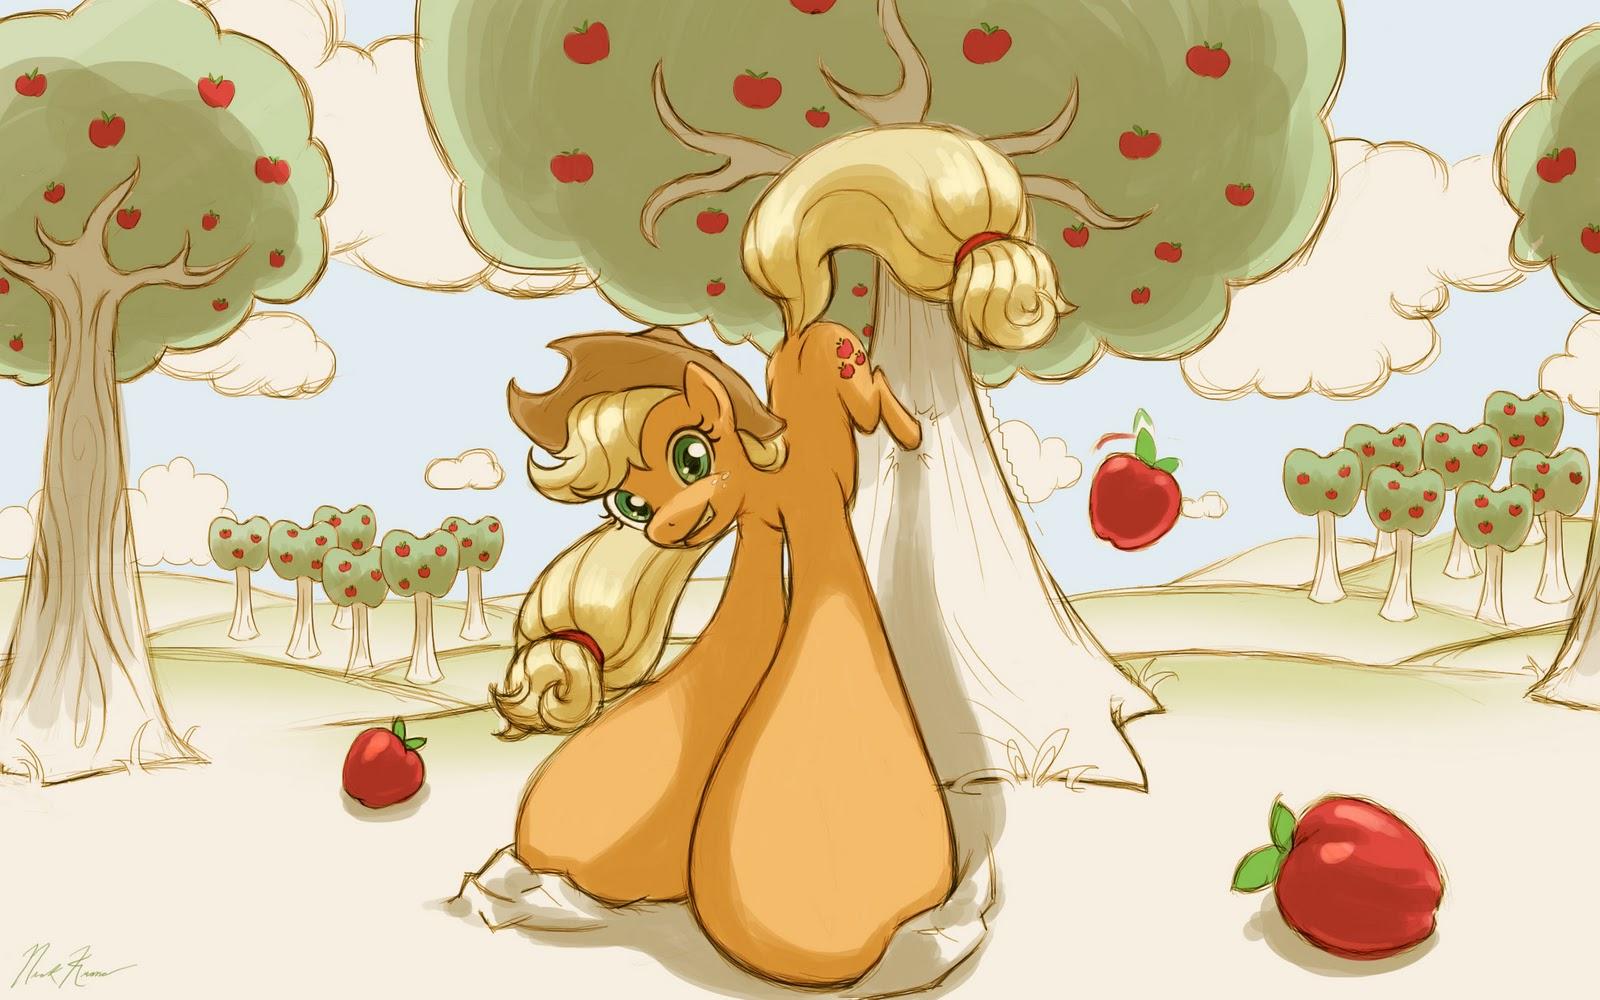 Rarity Applejack Pony Cartoon Art Fictional Character Illustration Flower